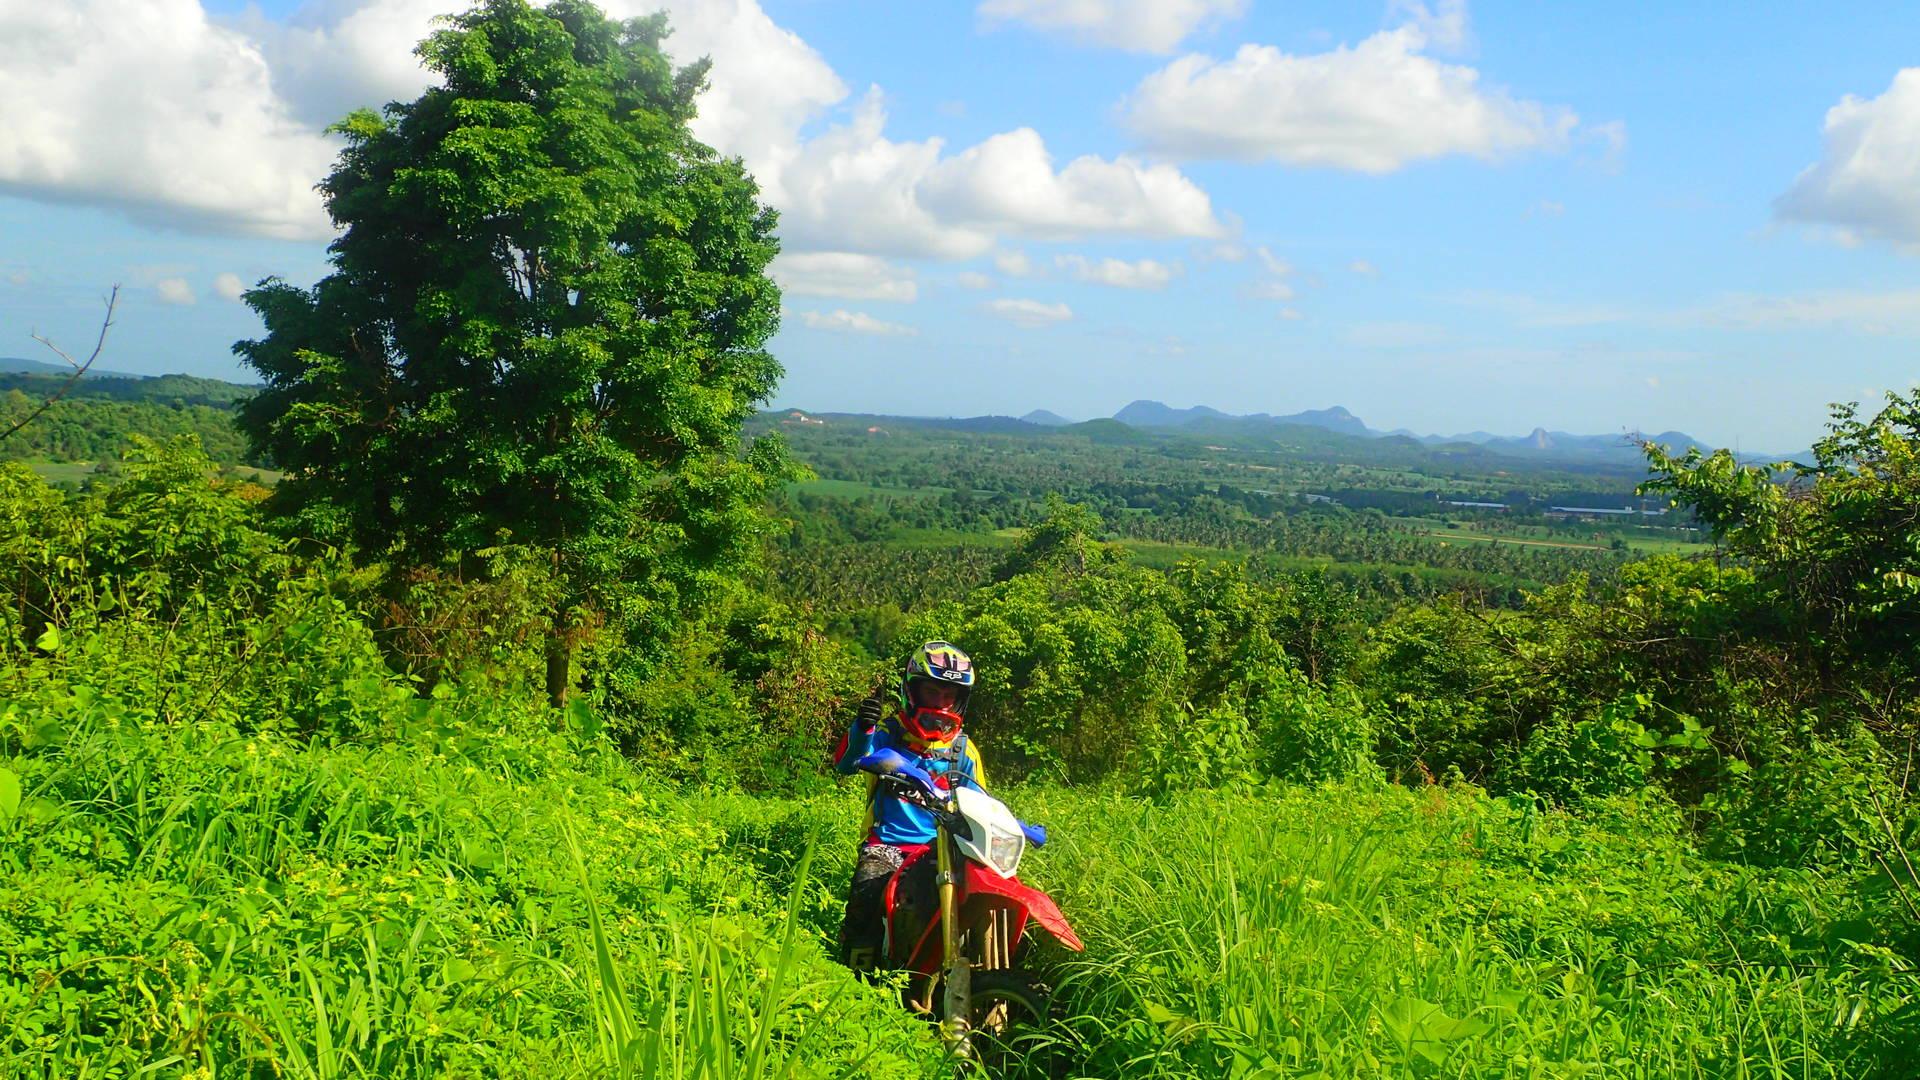 Pattaya Motorbike Tours